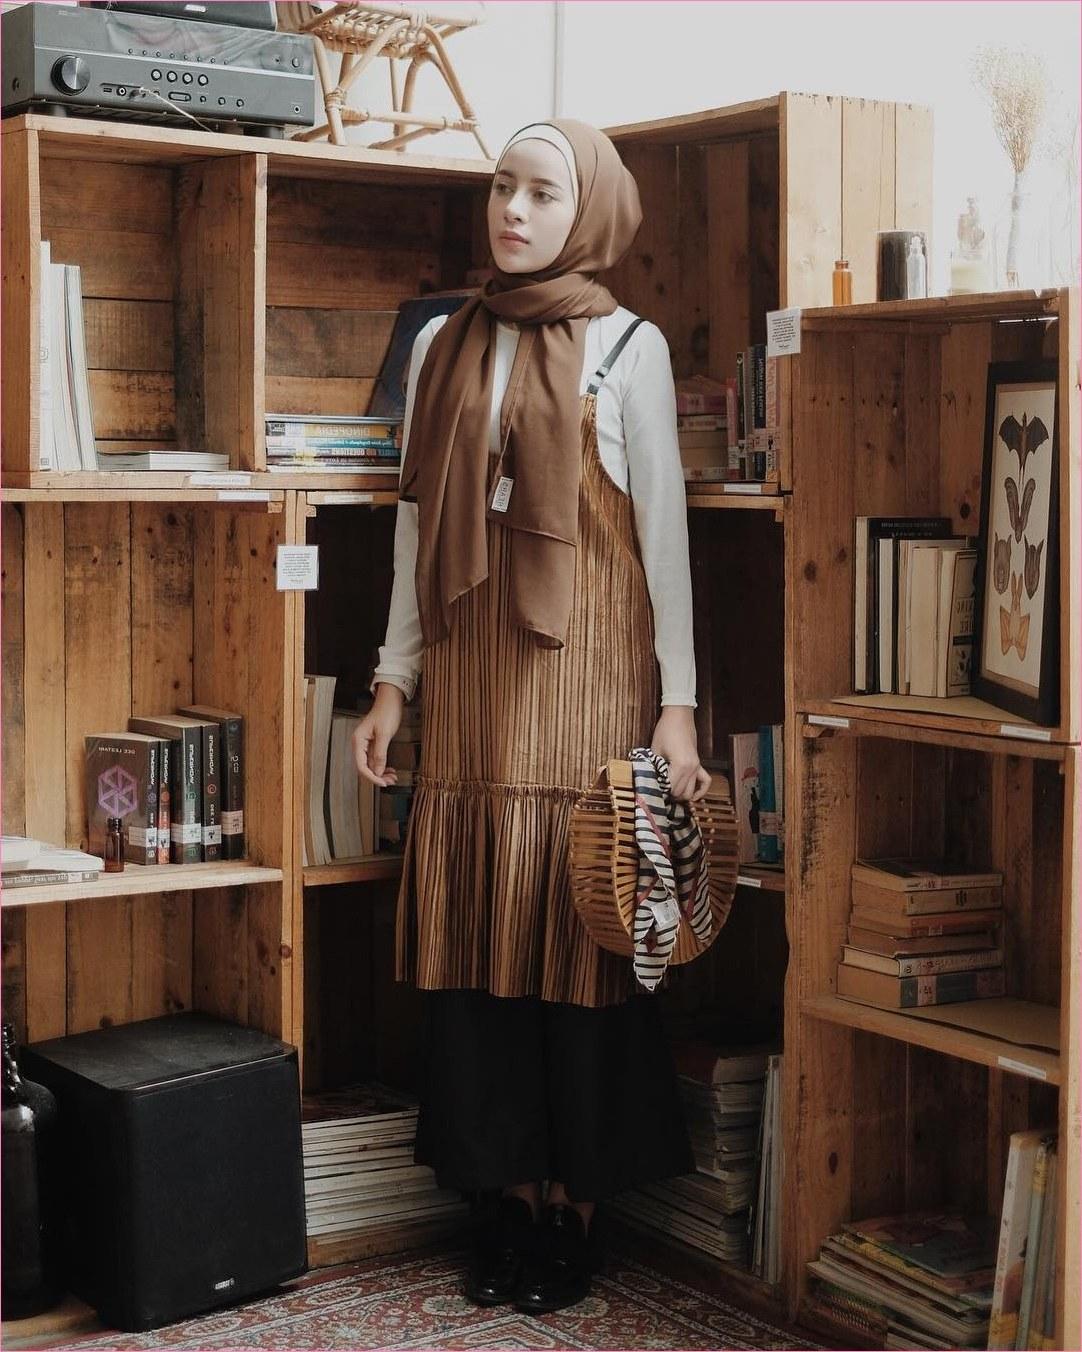 Bentuk Trend Model Baju Lebaran 2019 Nkde 80 Model Baju Lebaran Terbaru 2019 Muslimah Trendy Model